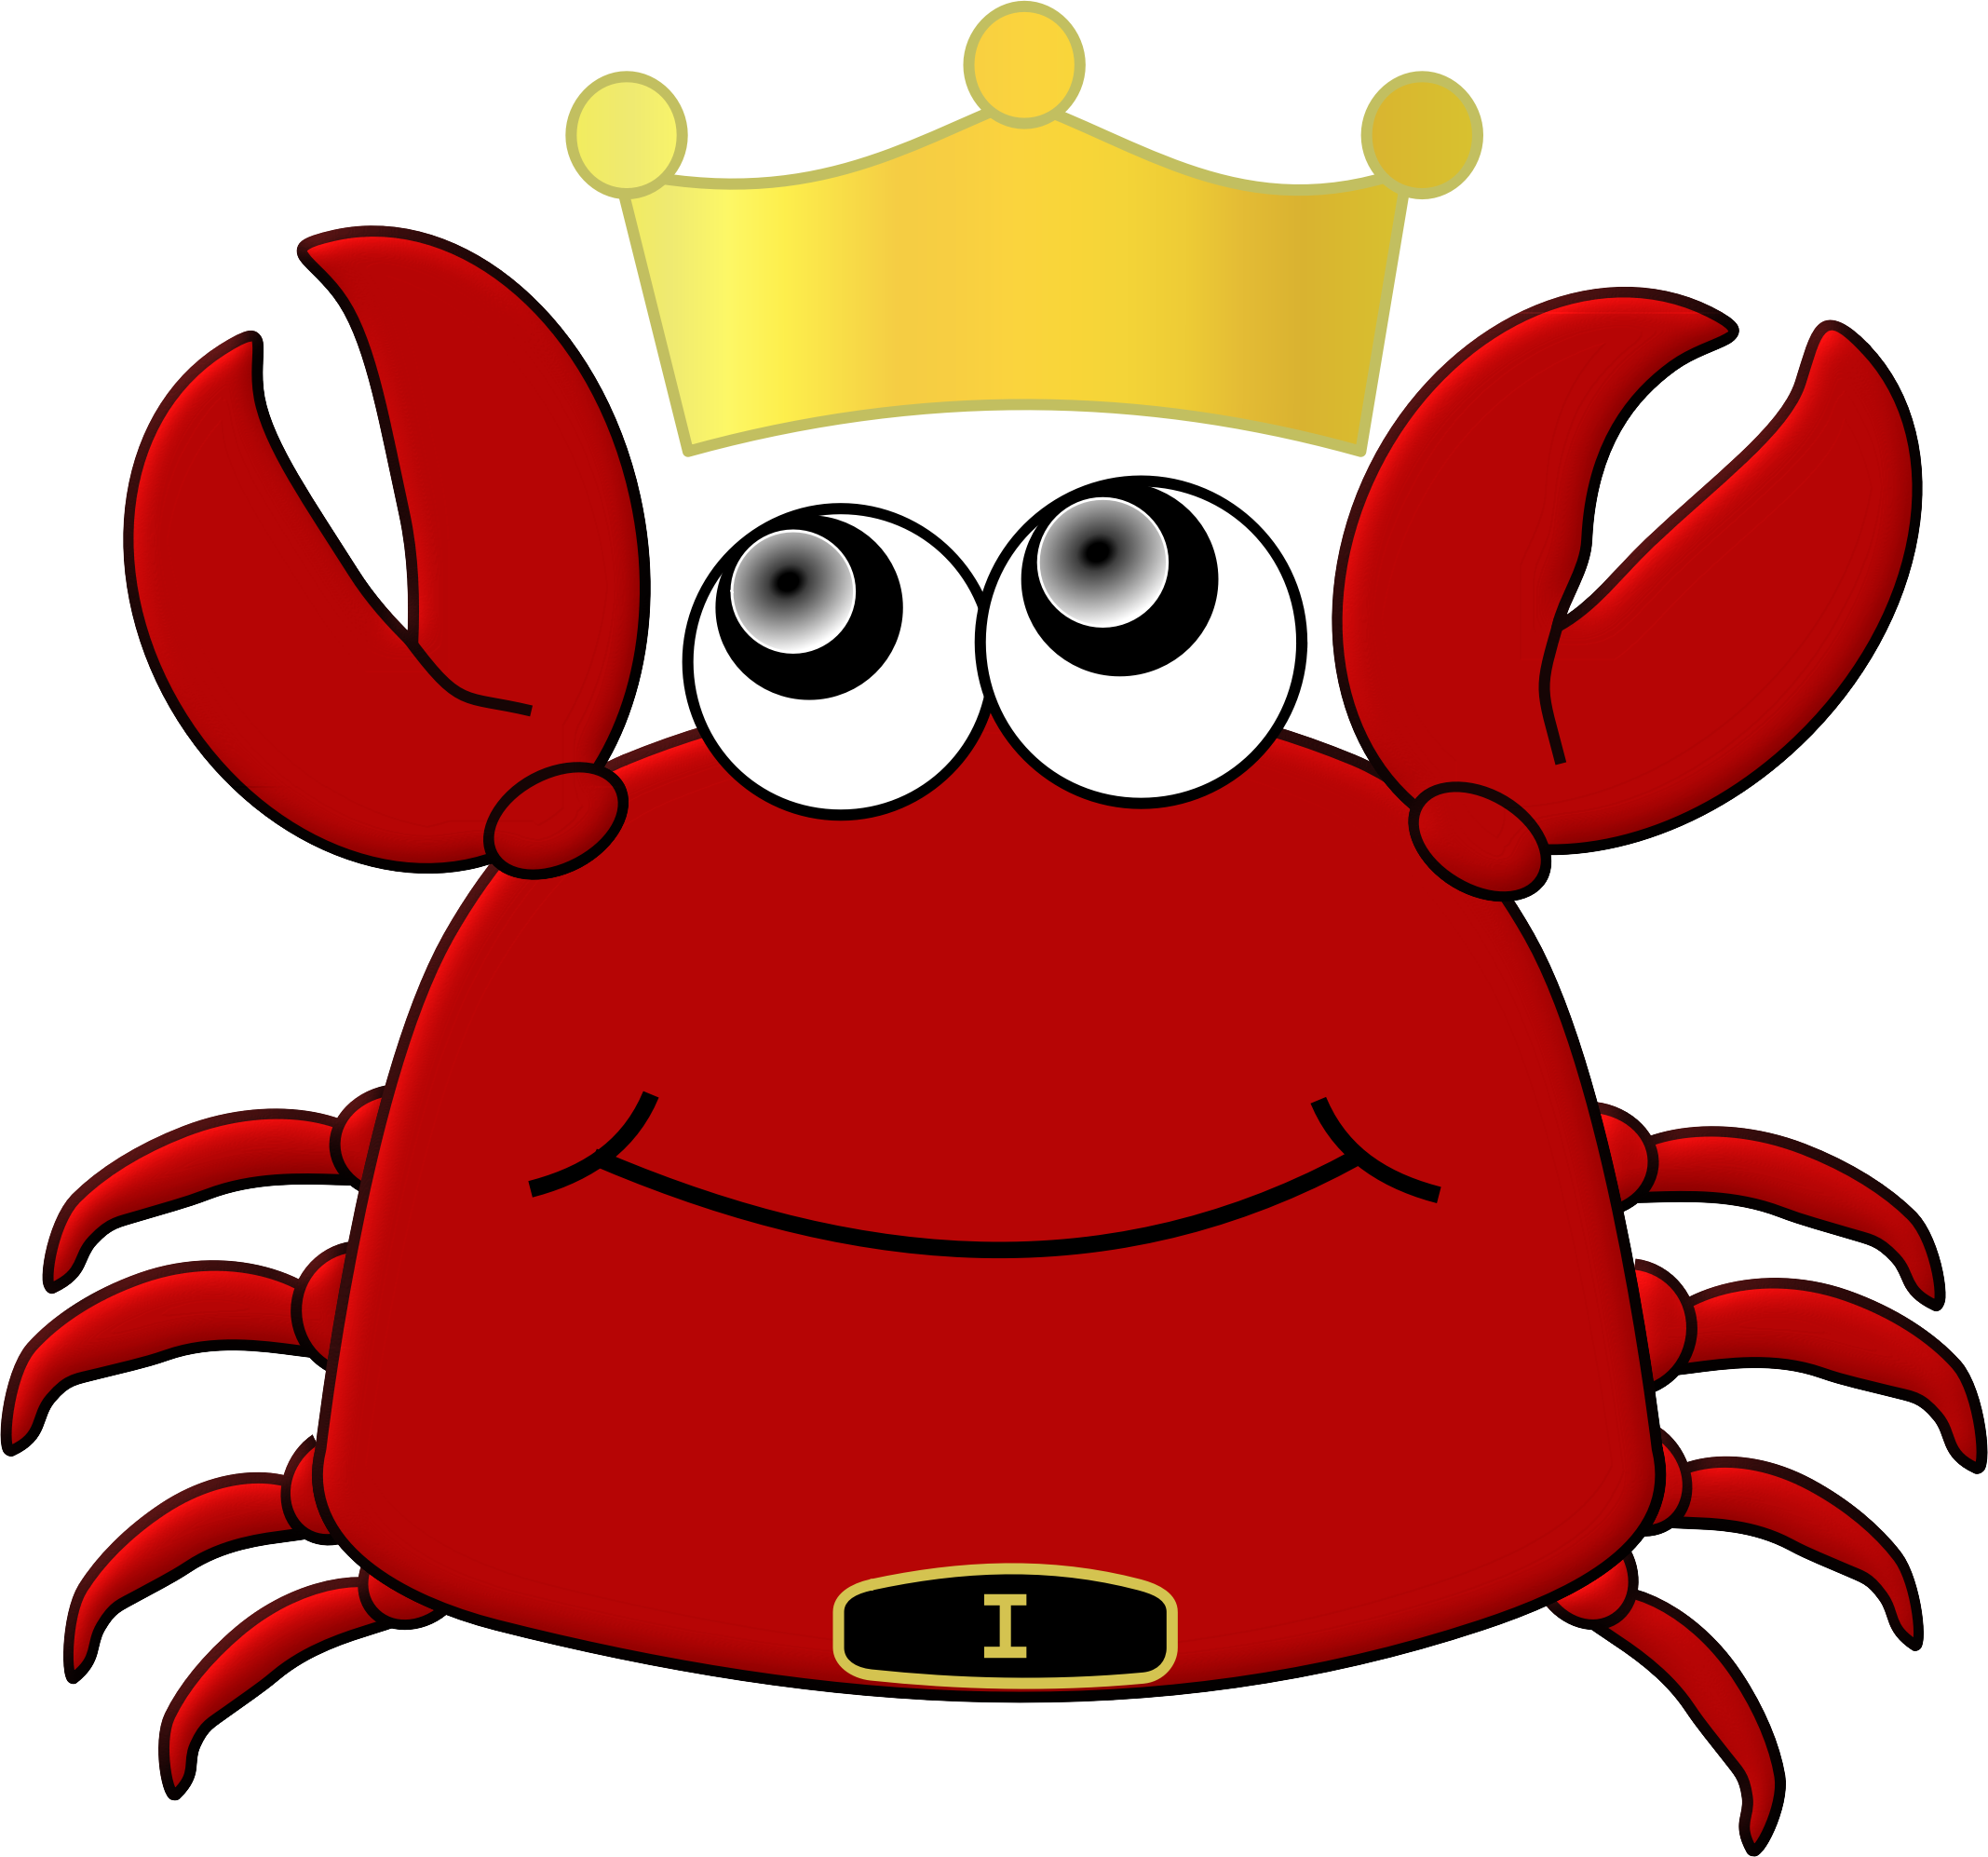 2135x1994 Free Of King Crab Cartoon Vector Files Clip Art